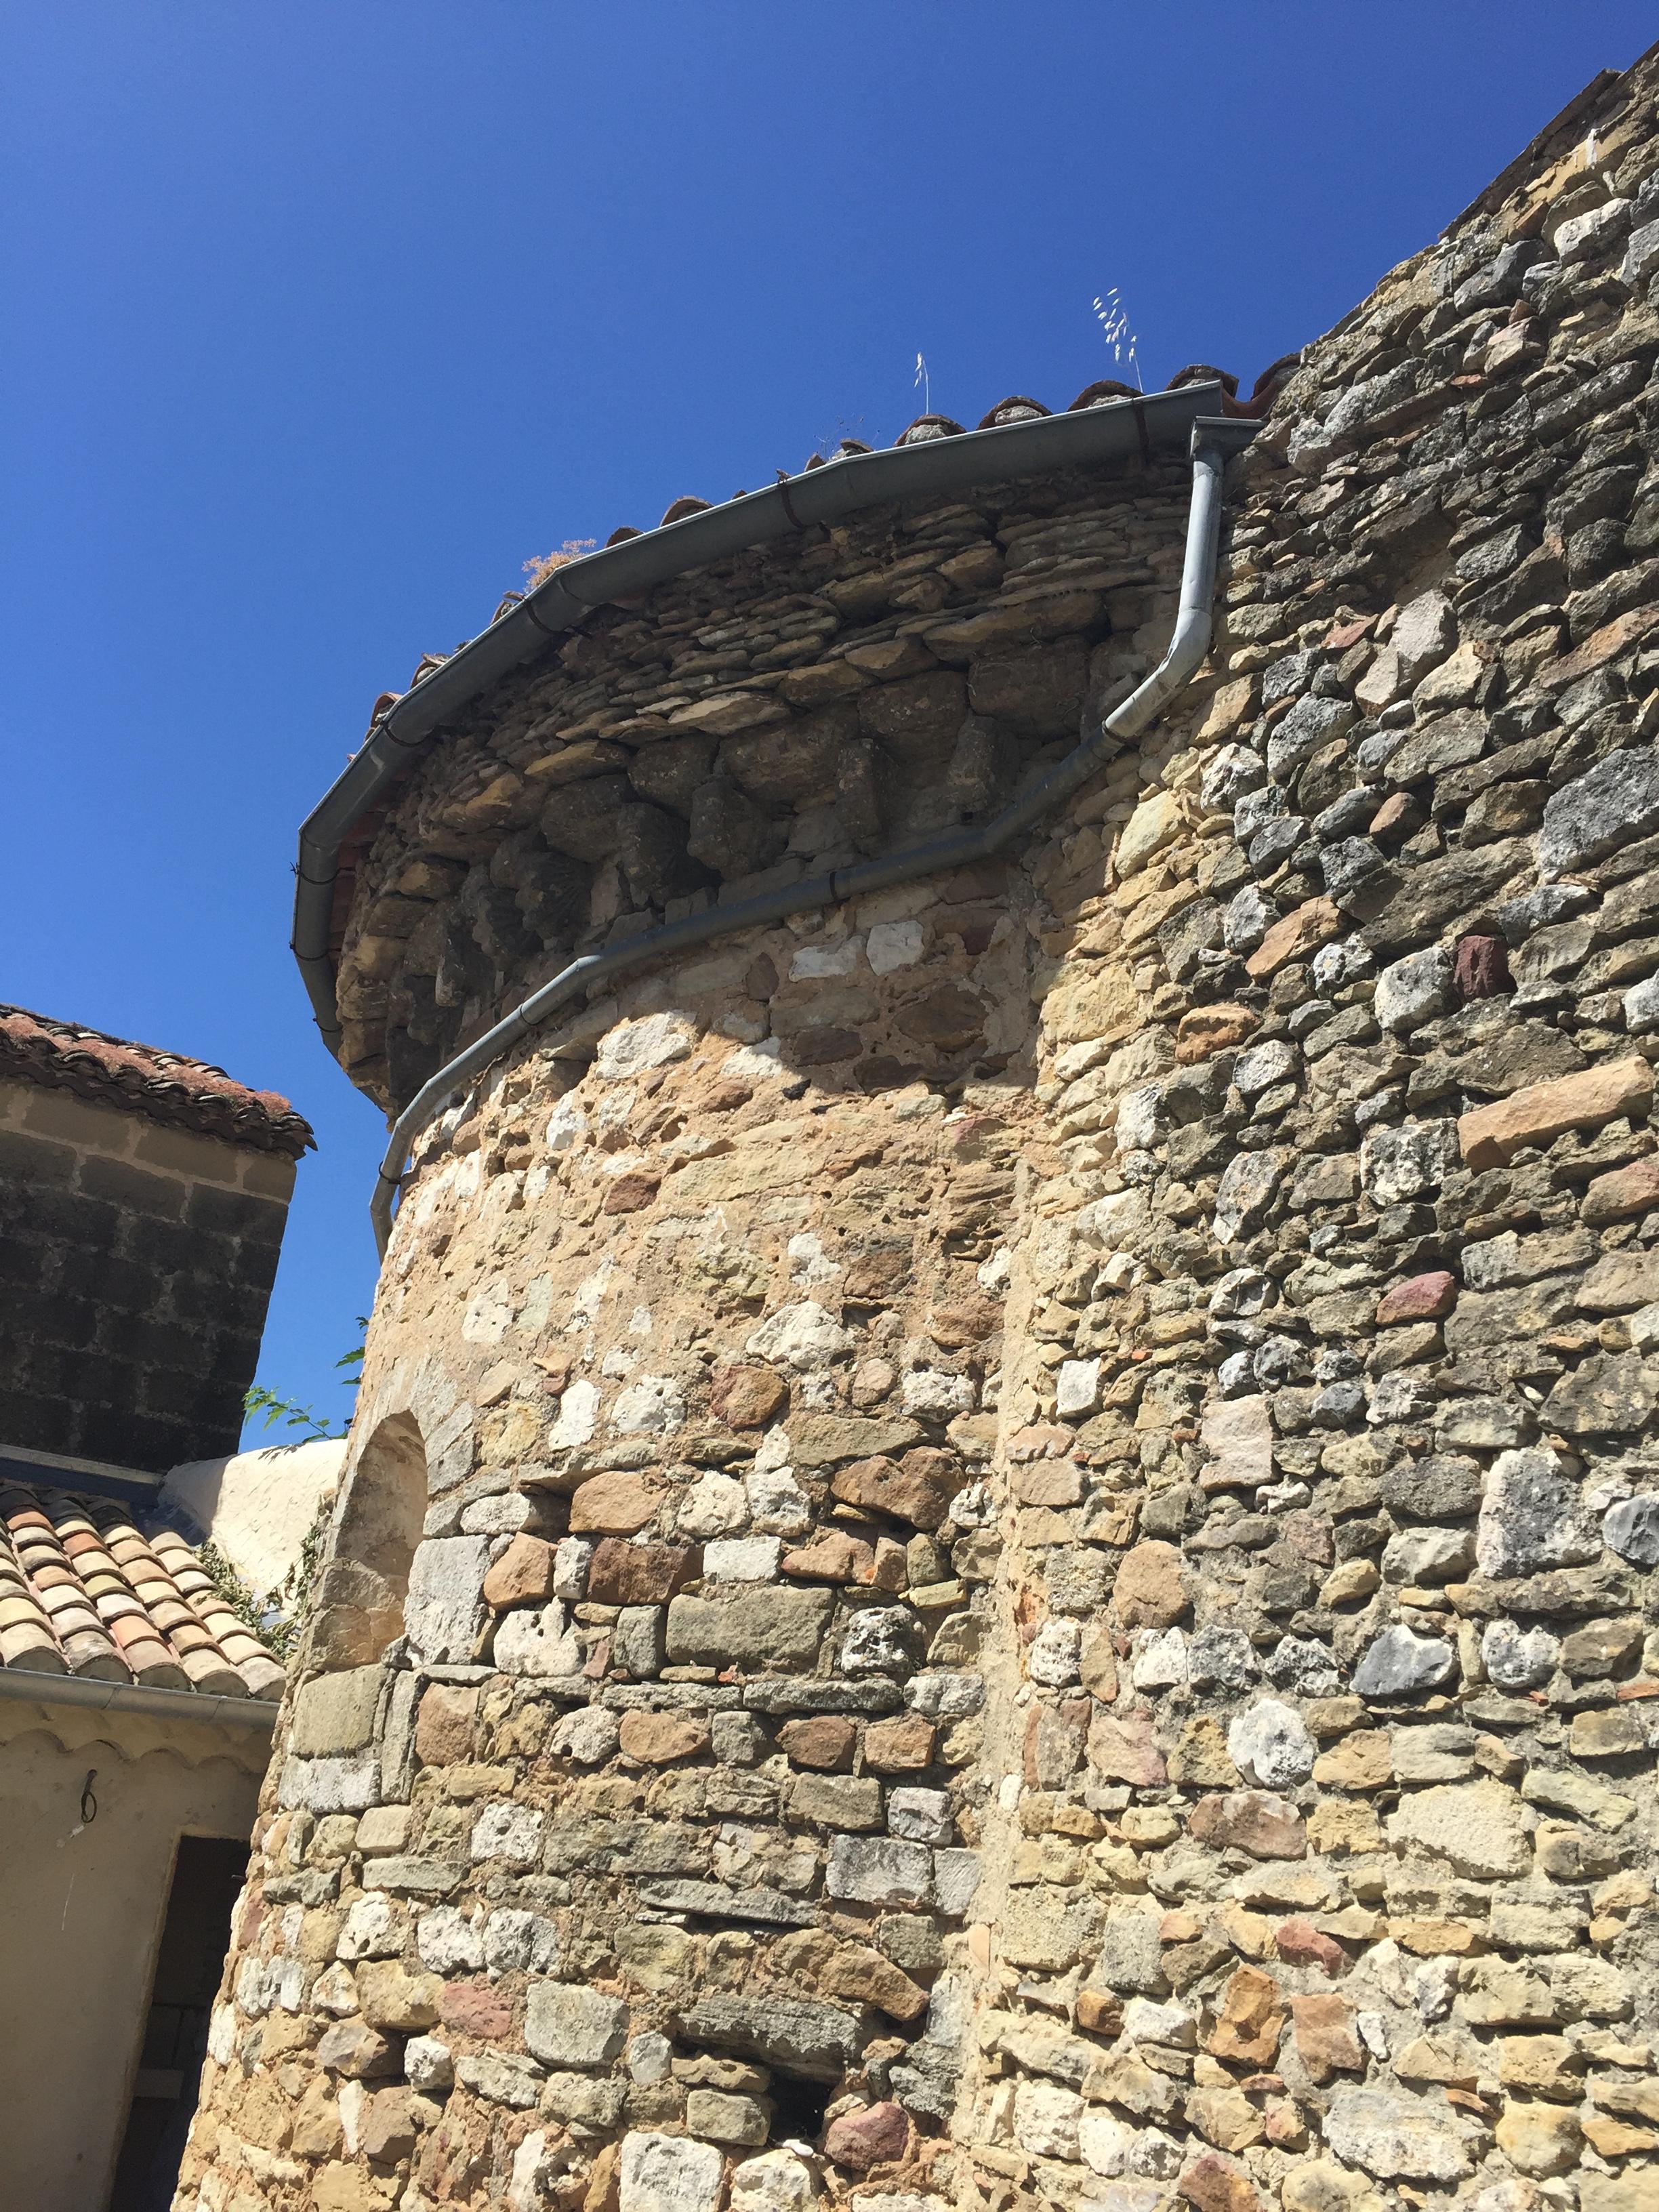 Eleventh century church outside Uzes